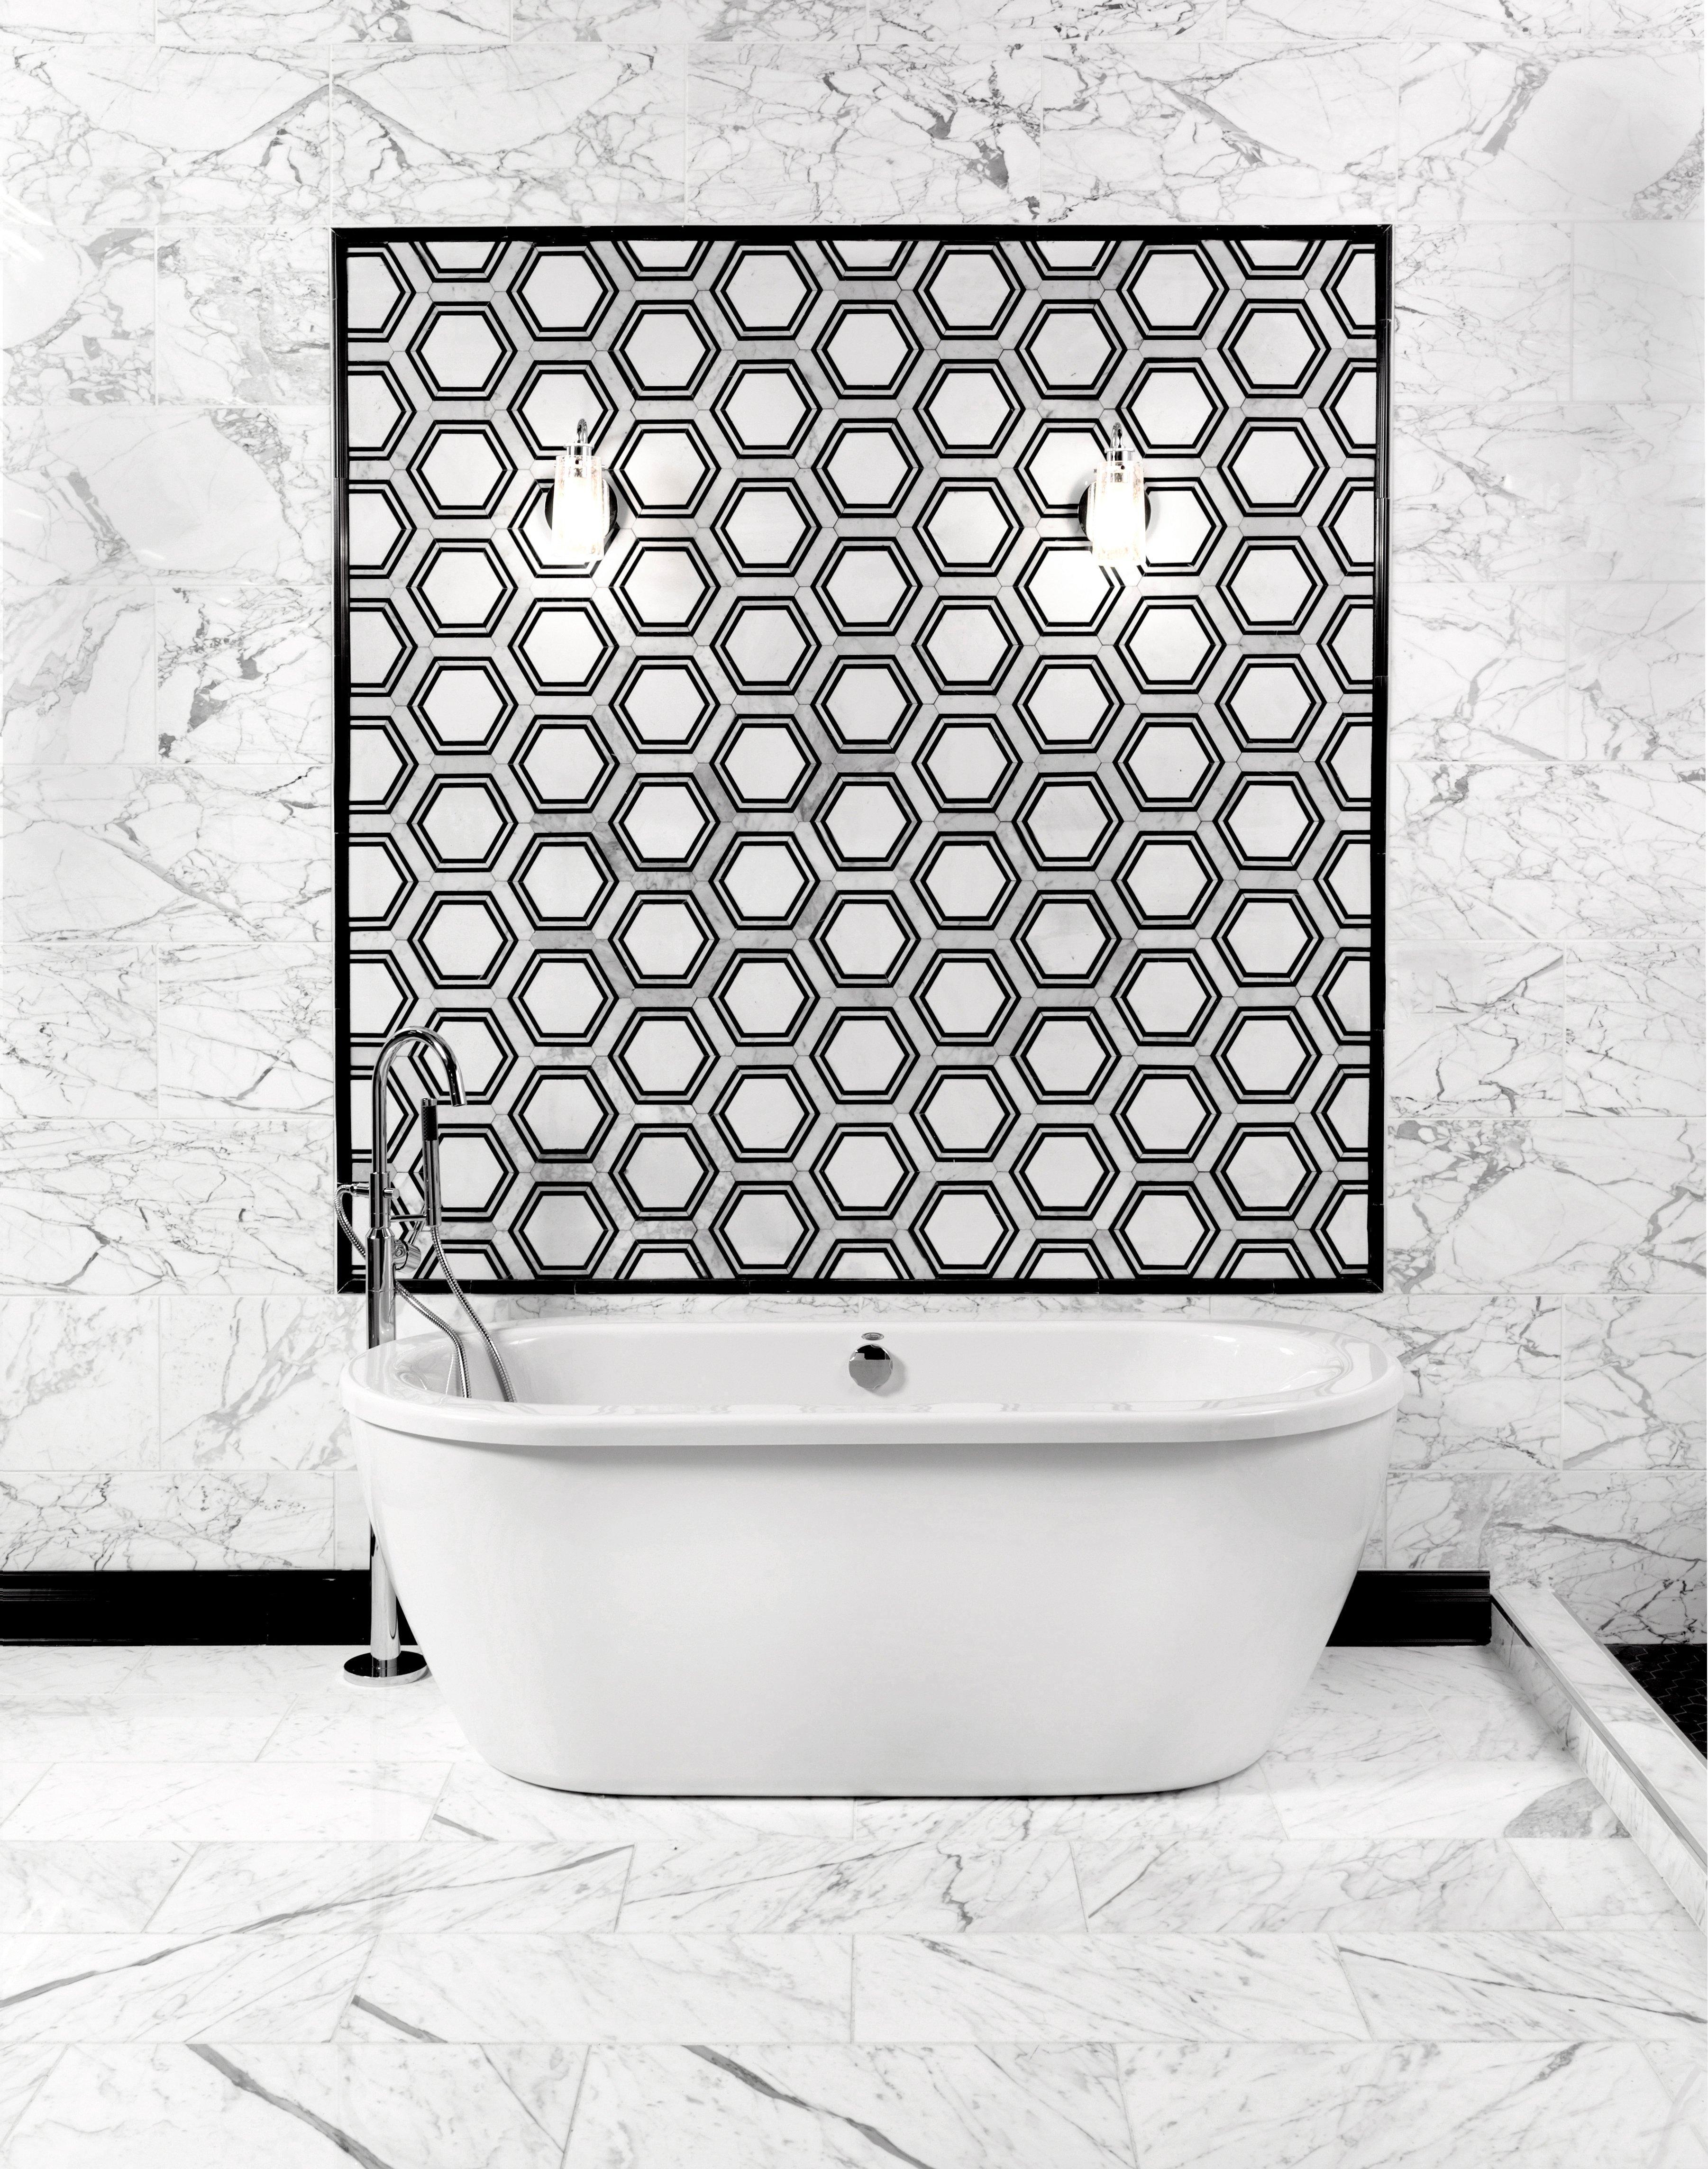 Carrara Thassos Hexagon Waterjet Marble Mosaic 14 X 16 100246065 Floor And Decor